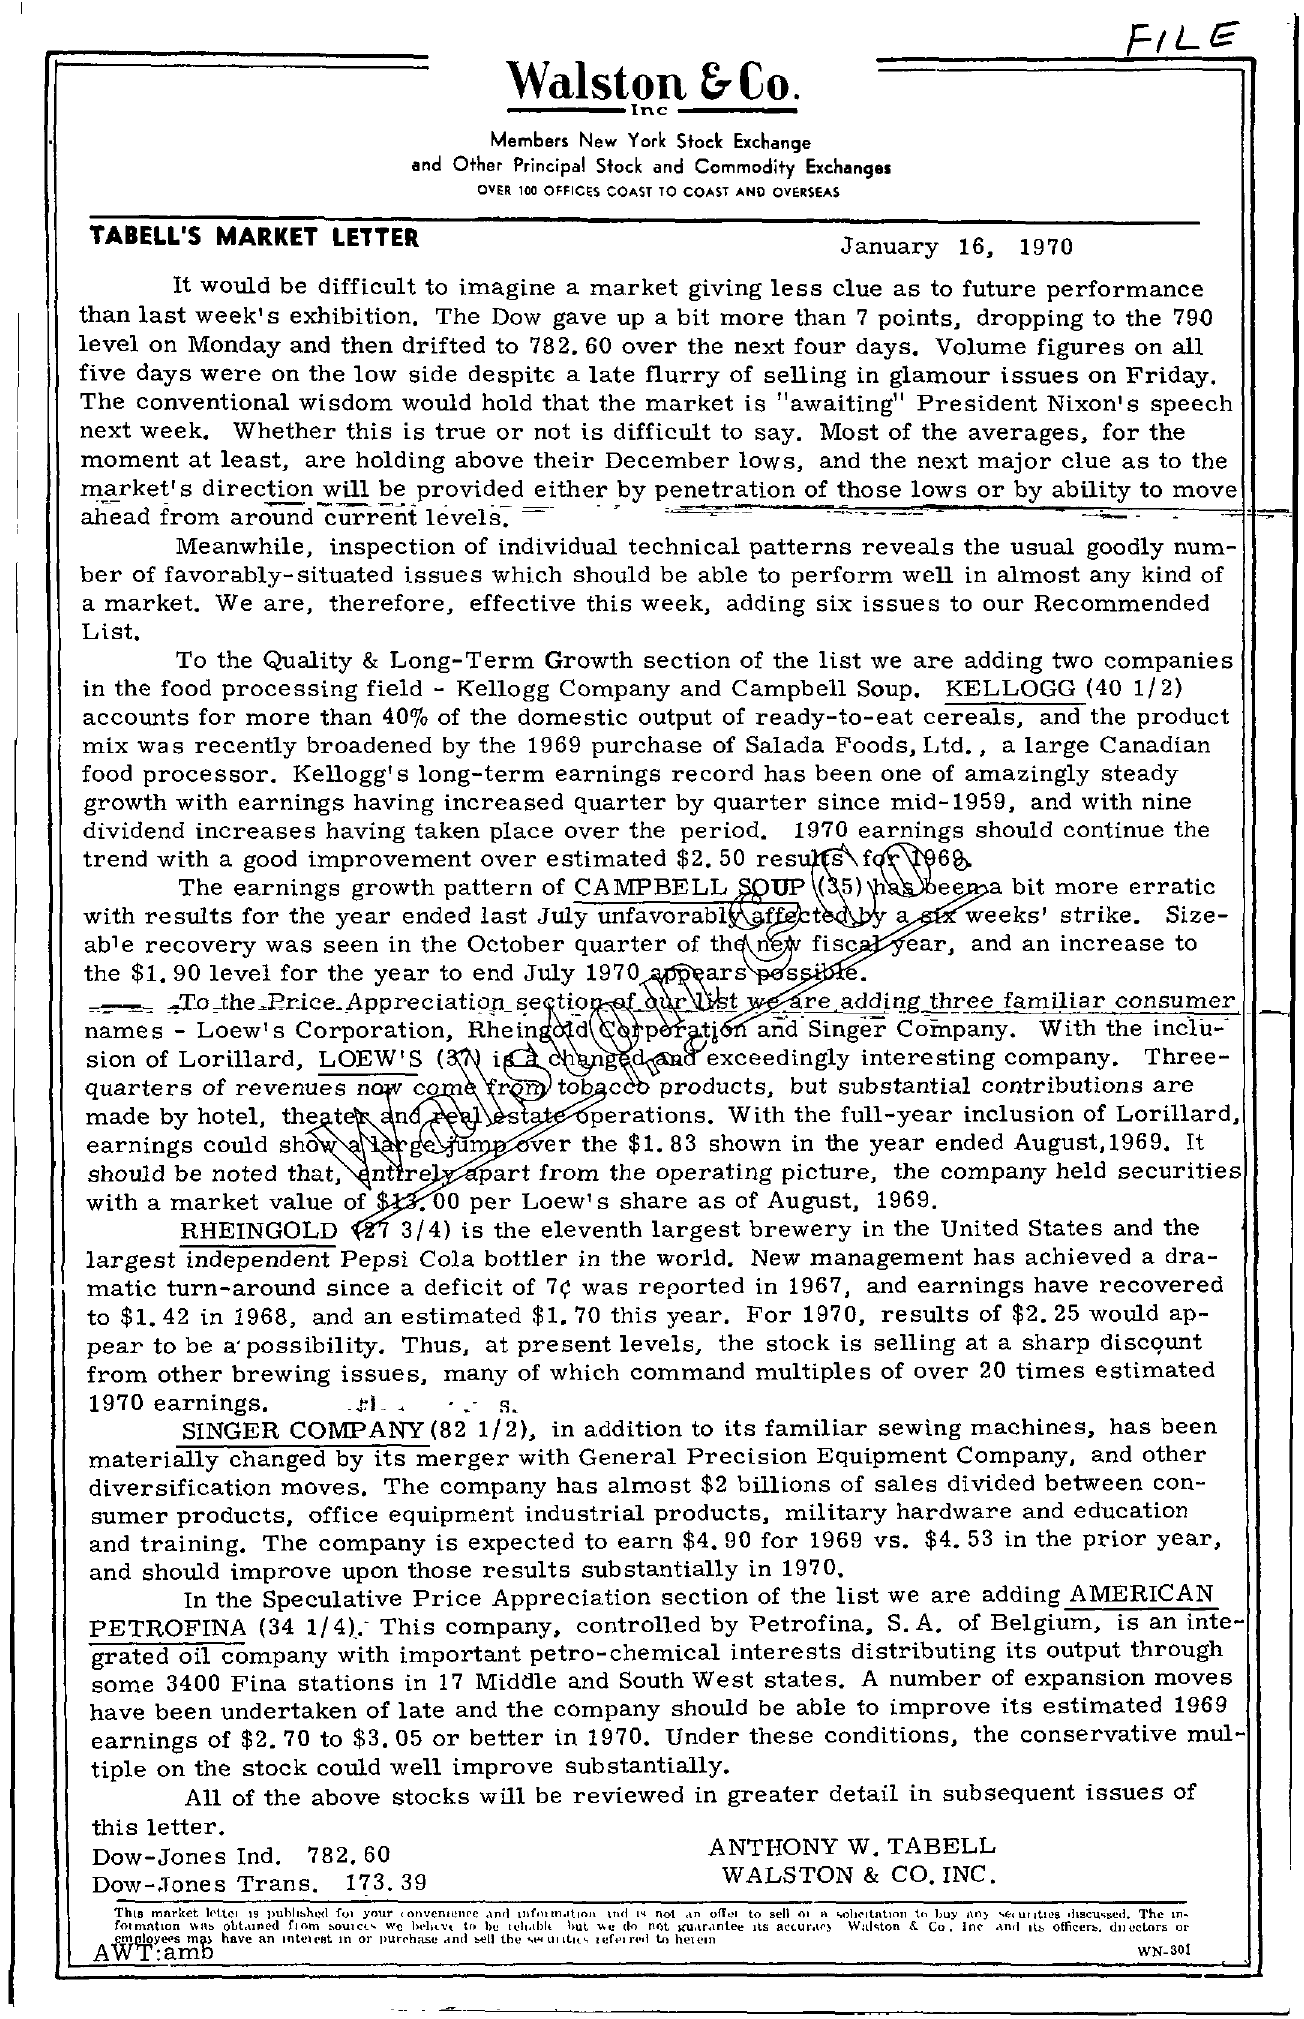 Tabell's Market Letter - January 16, 1970